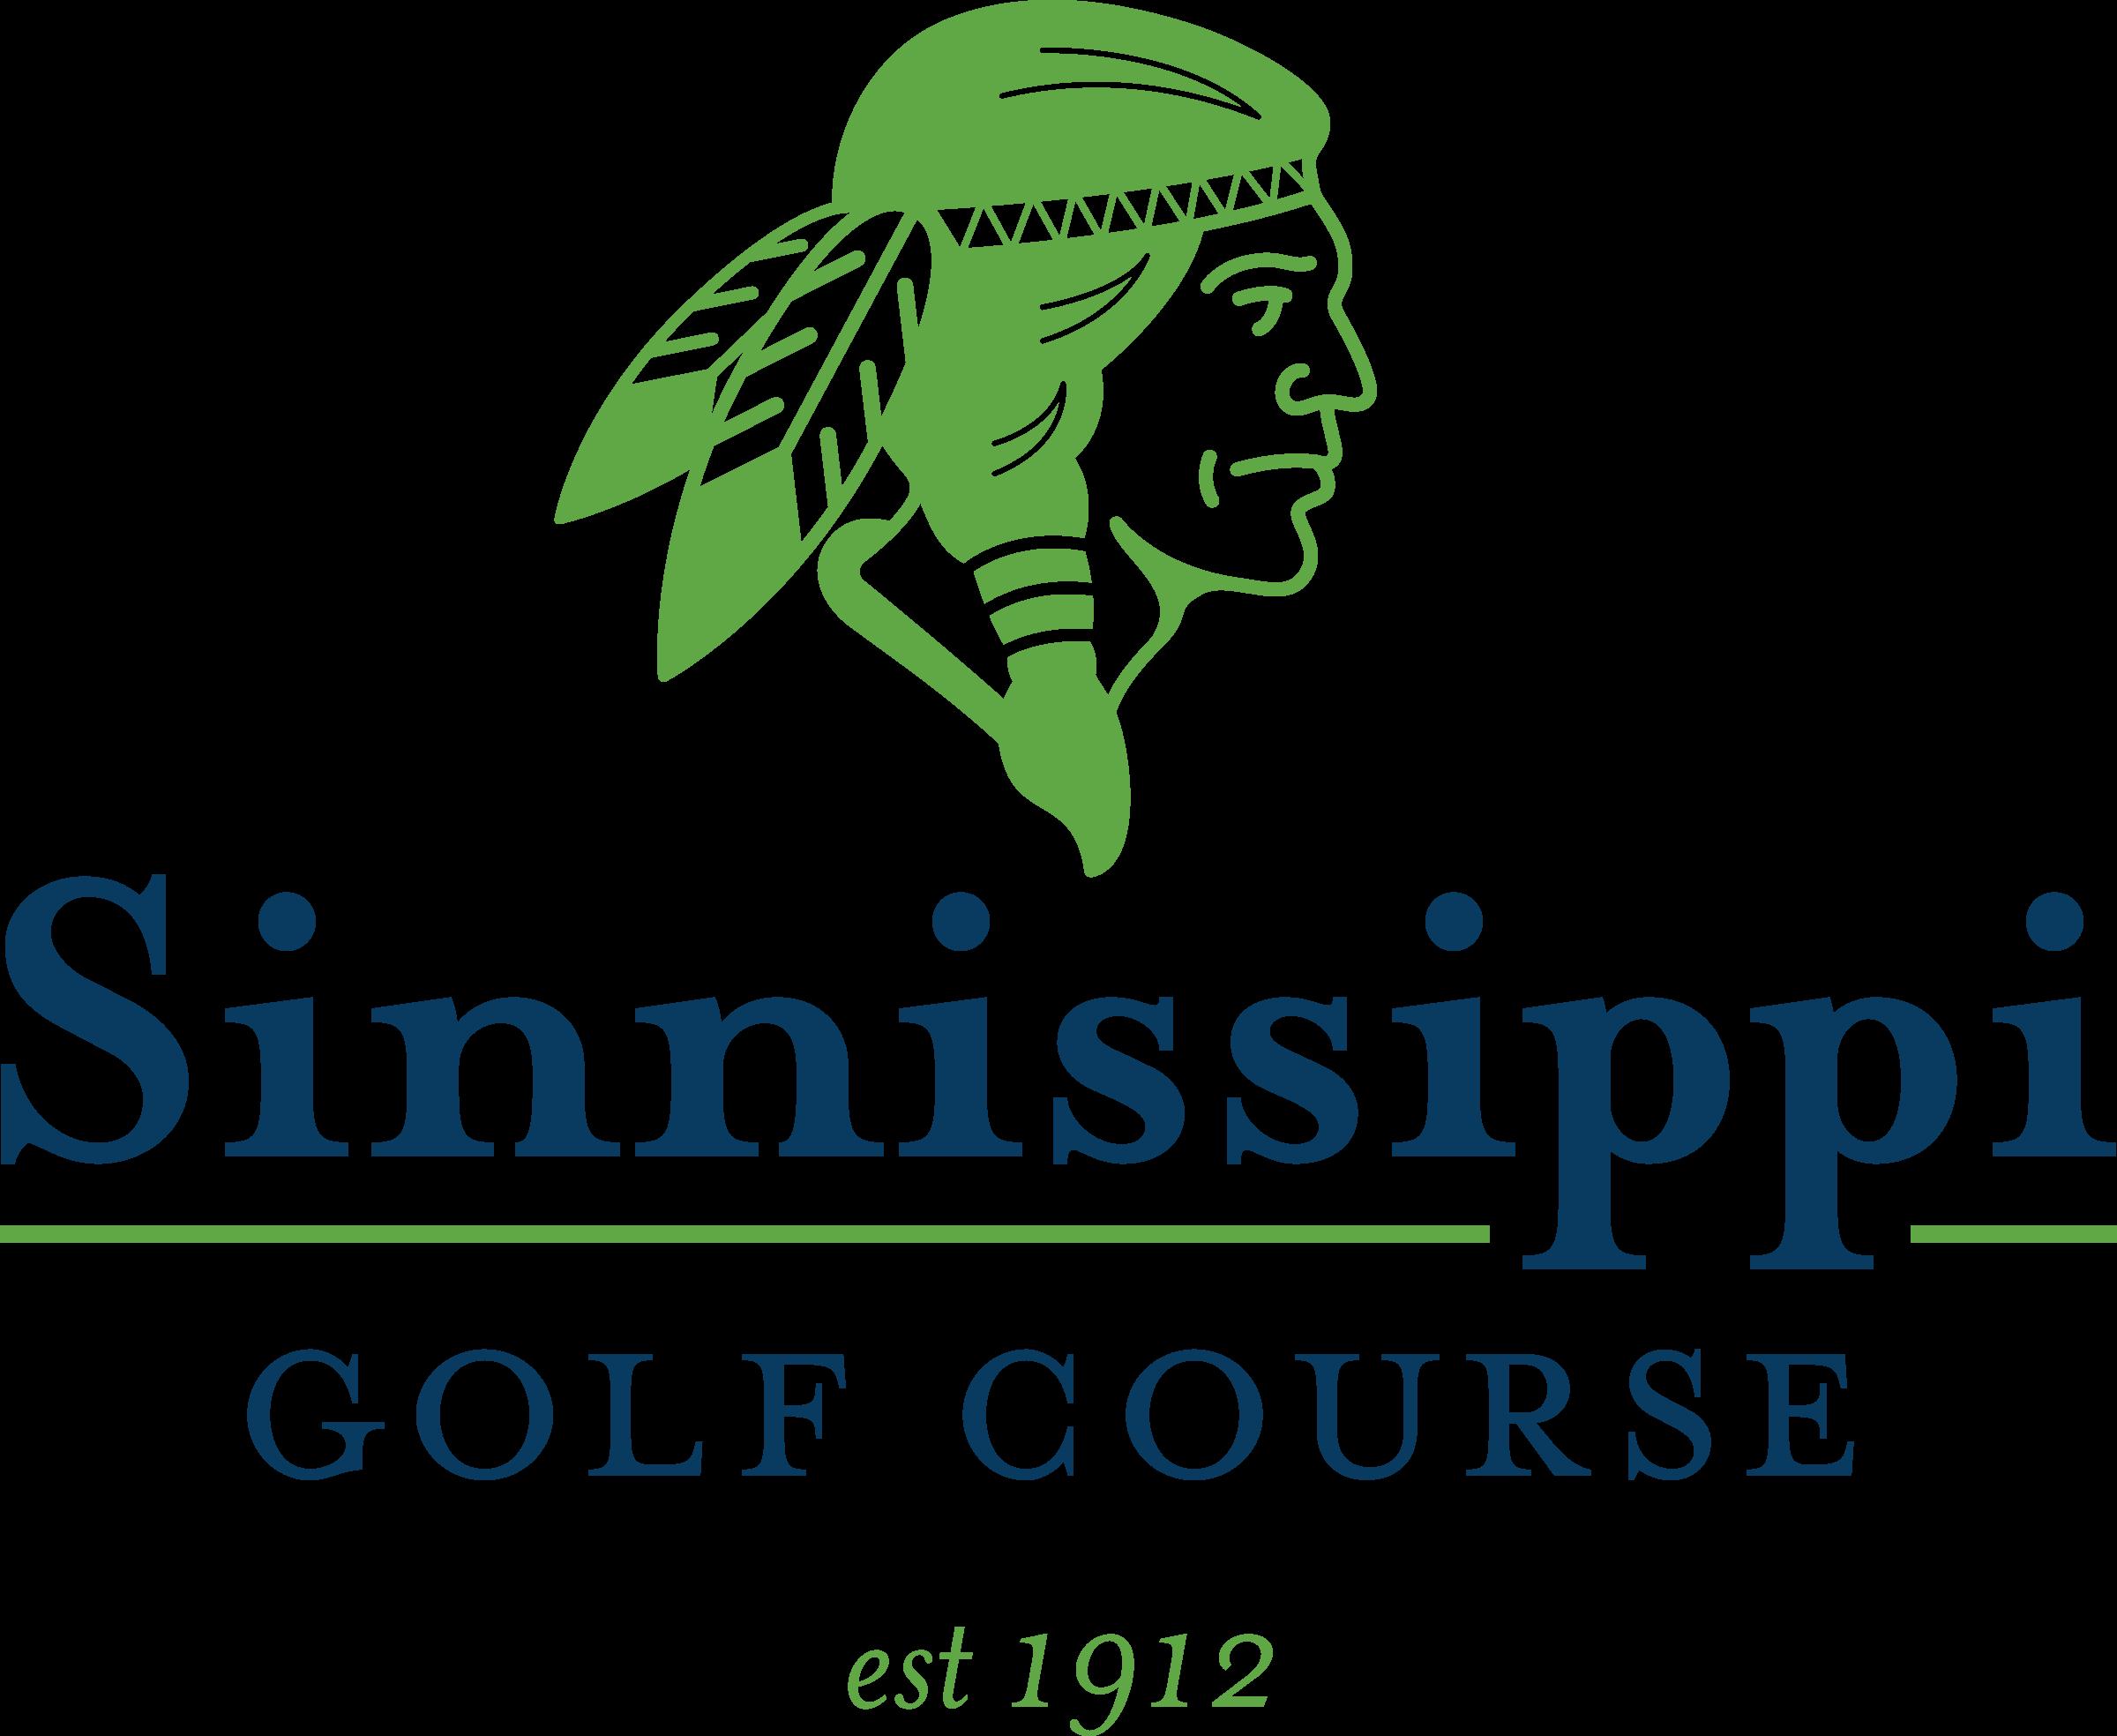 Sinnissippi_GC_logo-C1.png